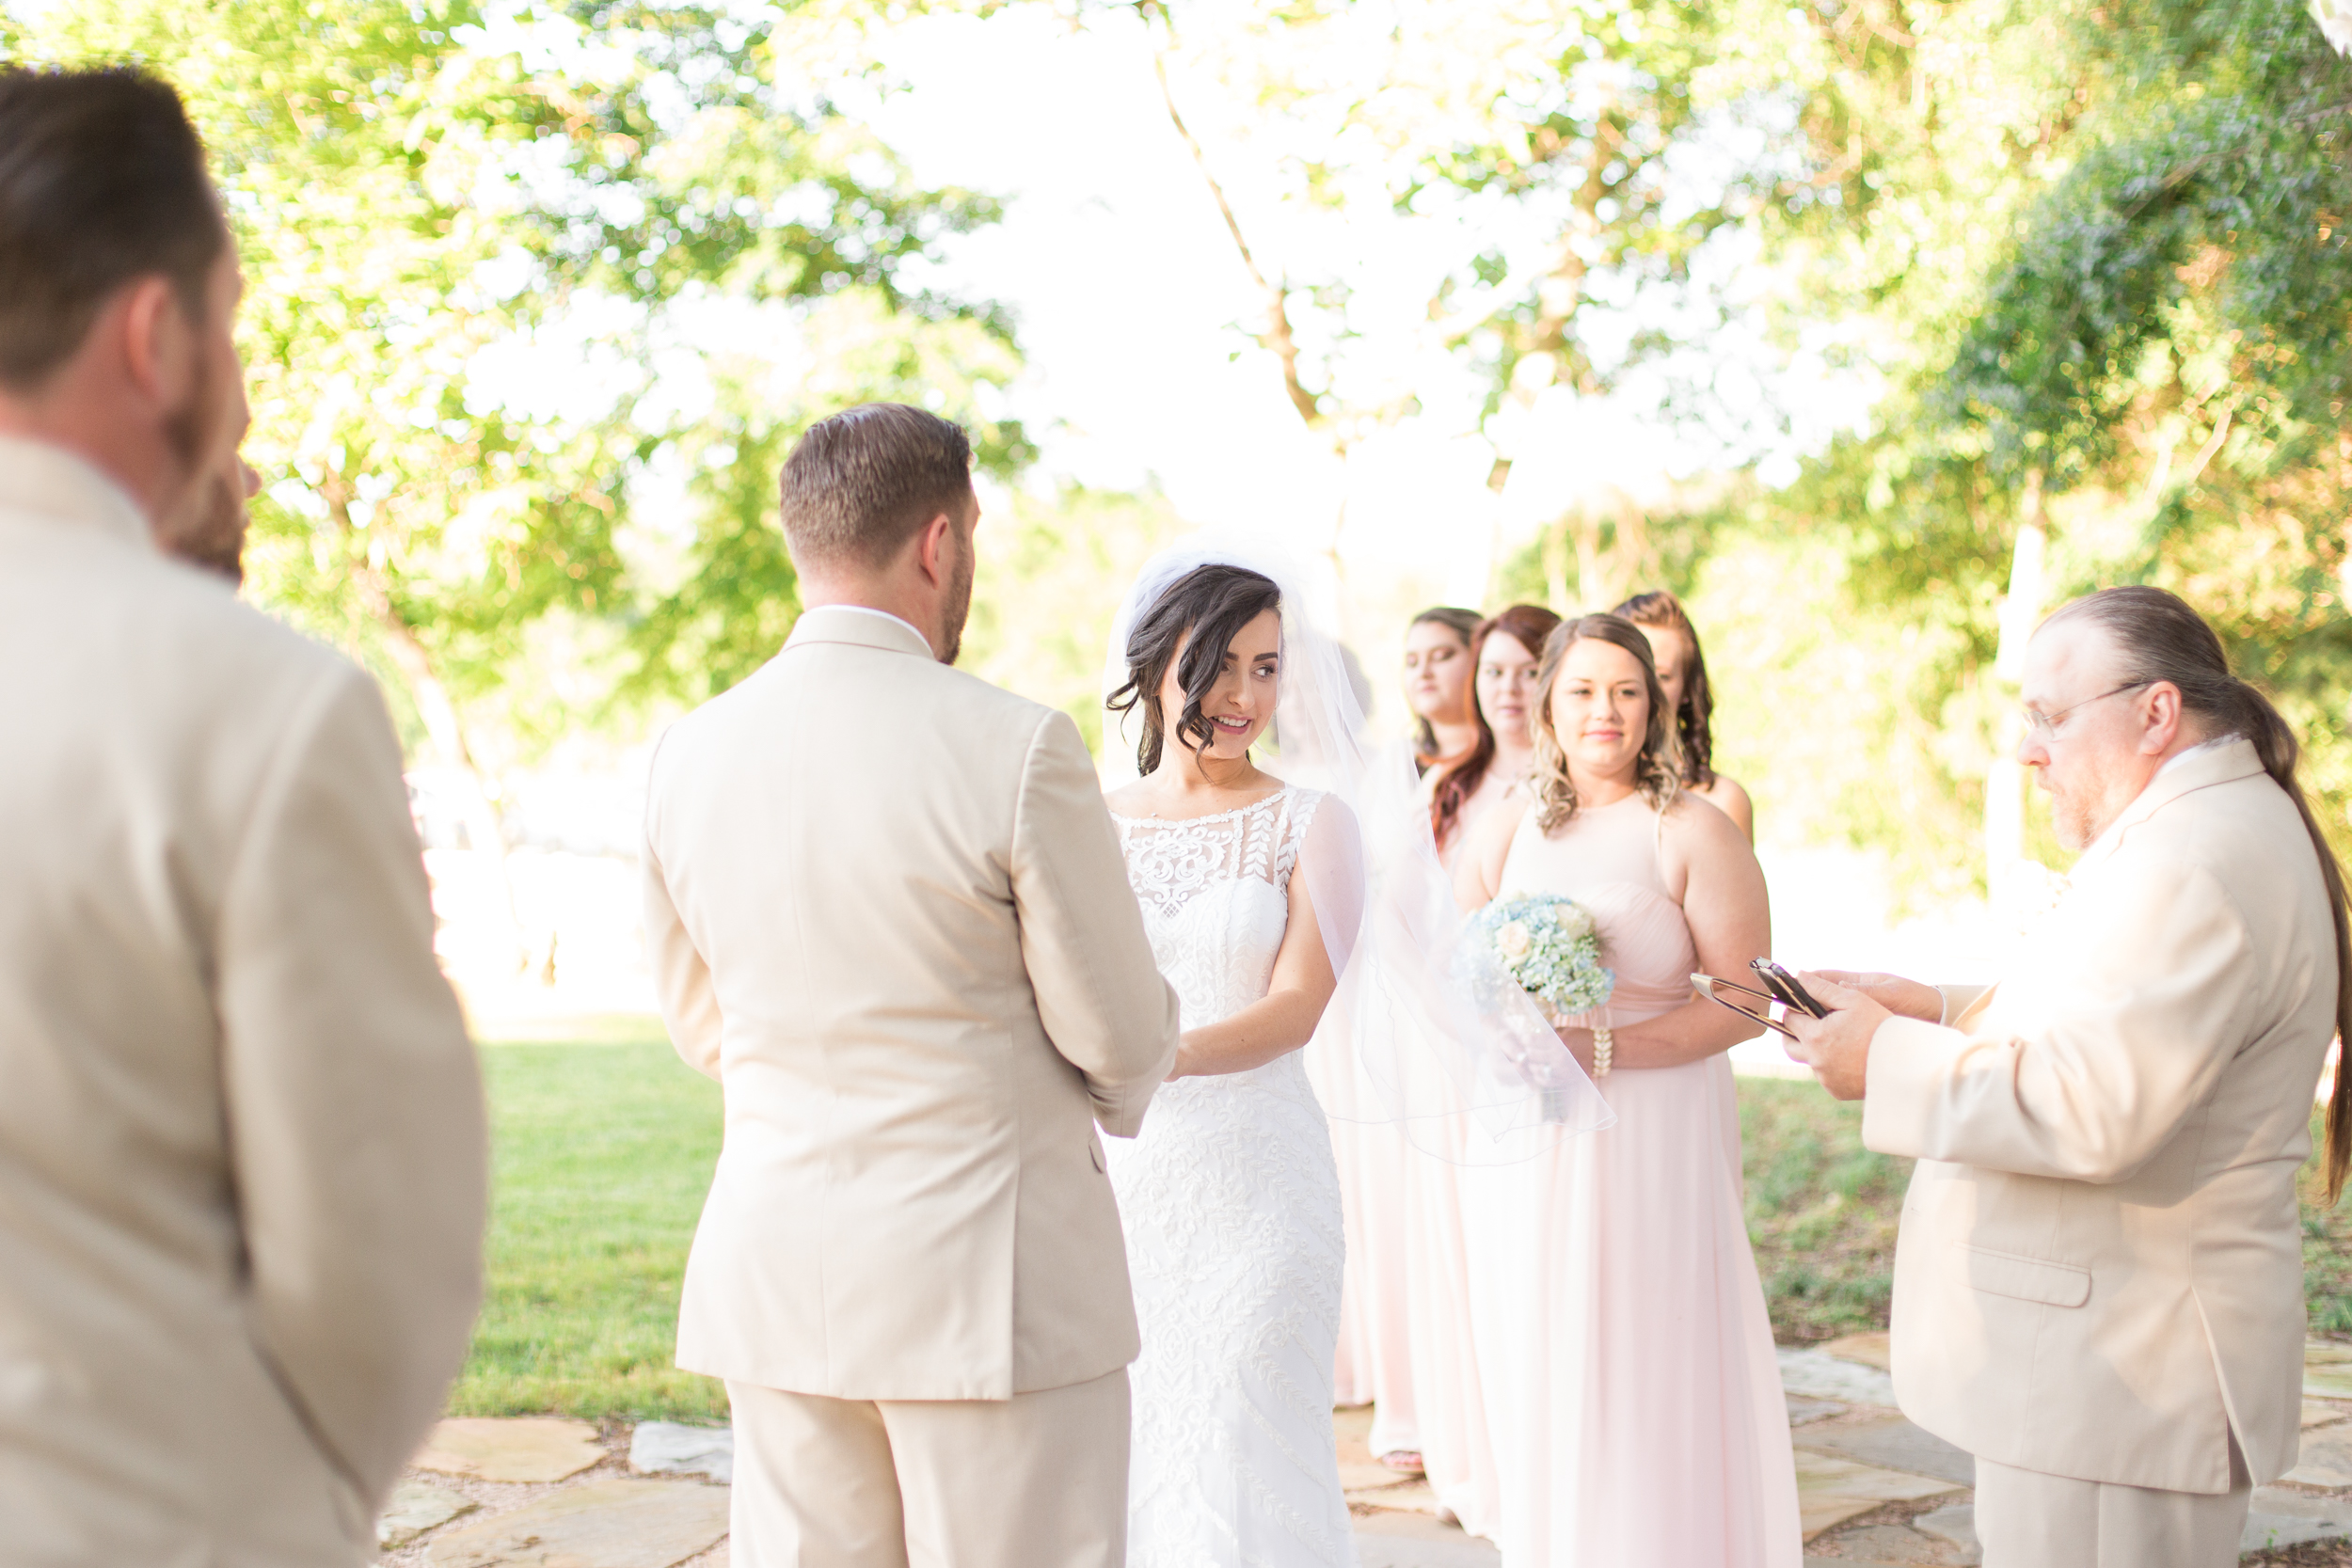 Zihlman-East TX Wedding_Kelsie Hendricks Photography_The Folmar Tyler Texas-106.jpg